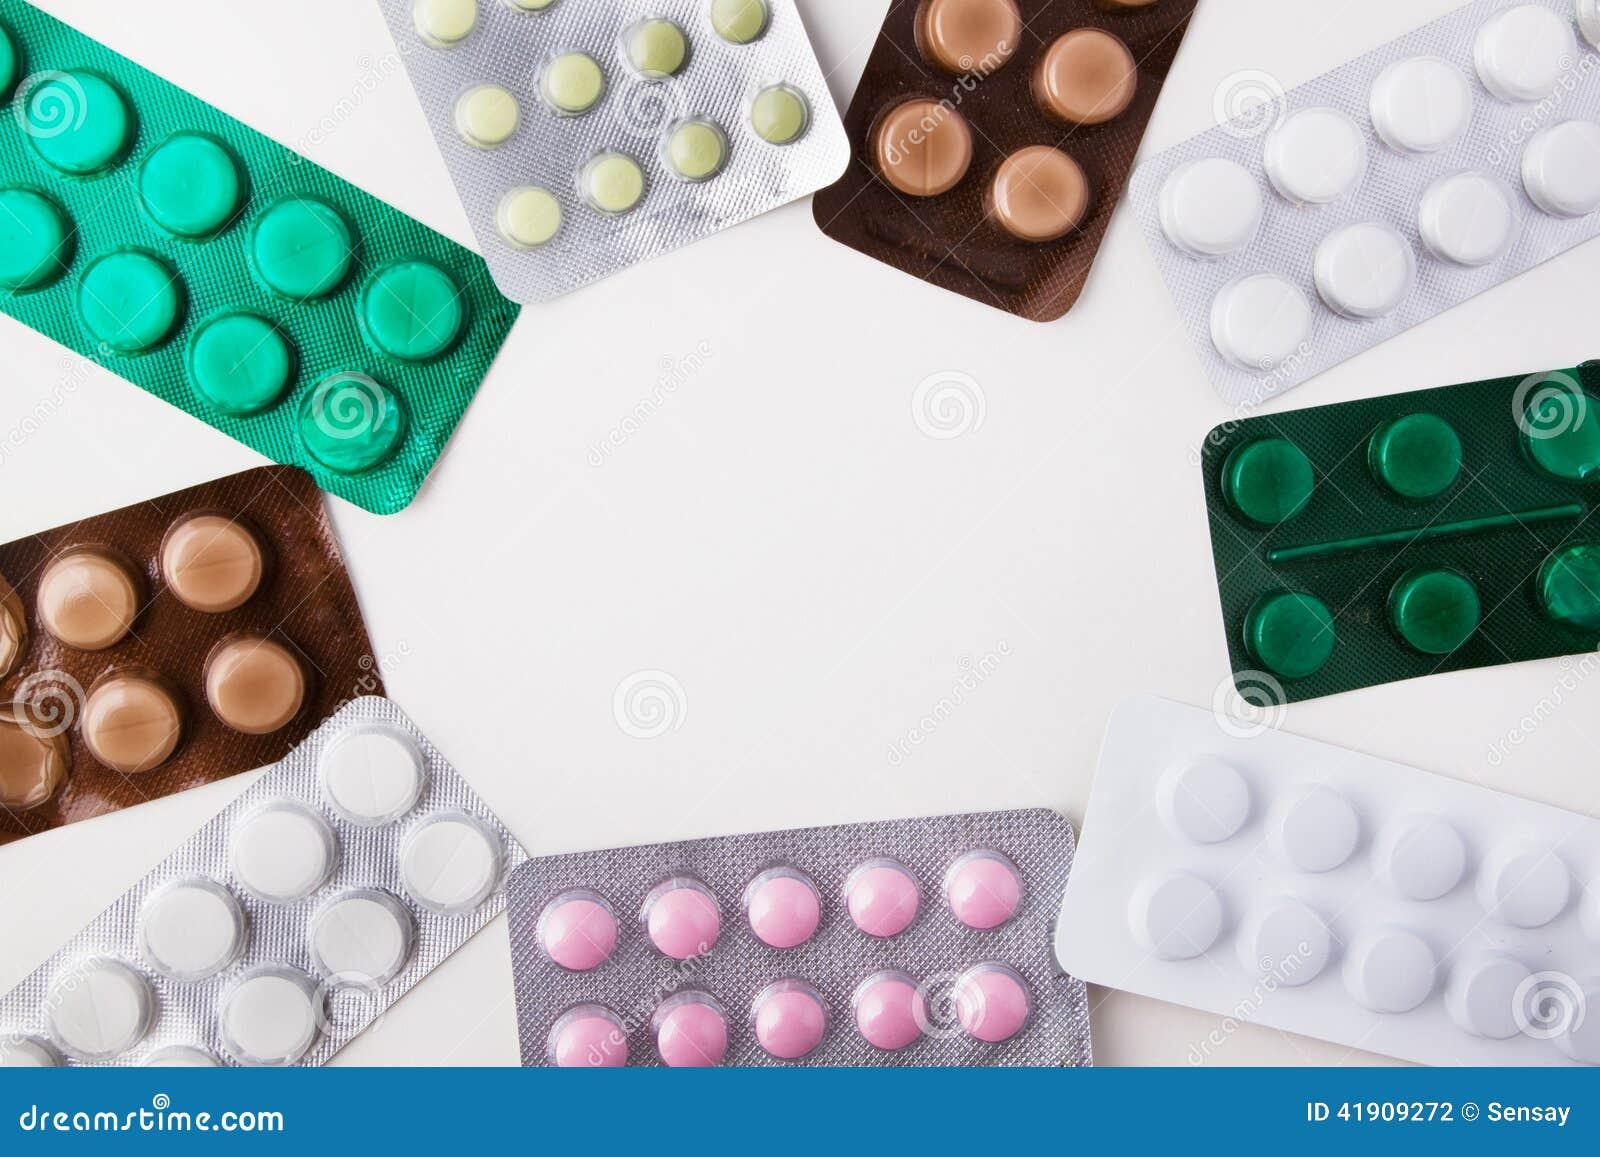 Capítulo de píldoras en paquete de ampolla